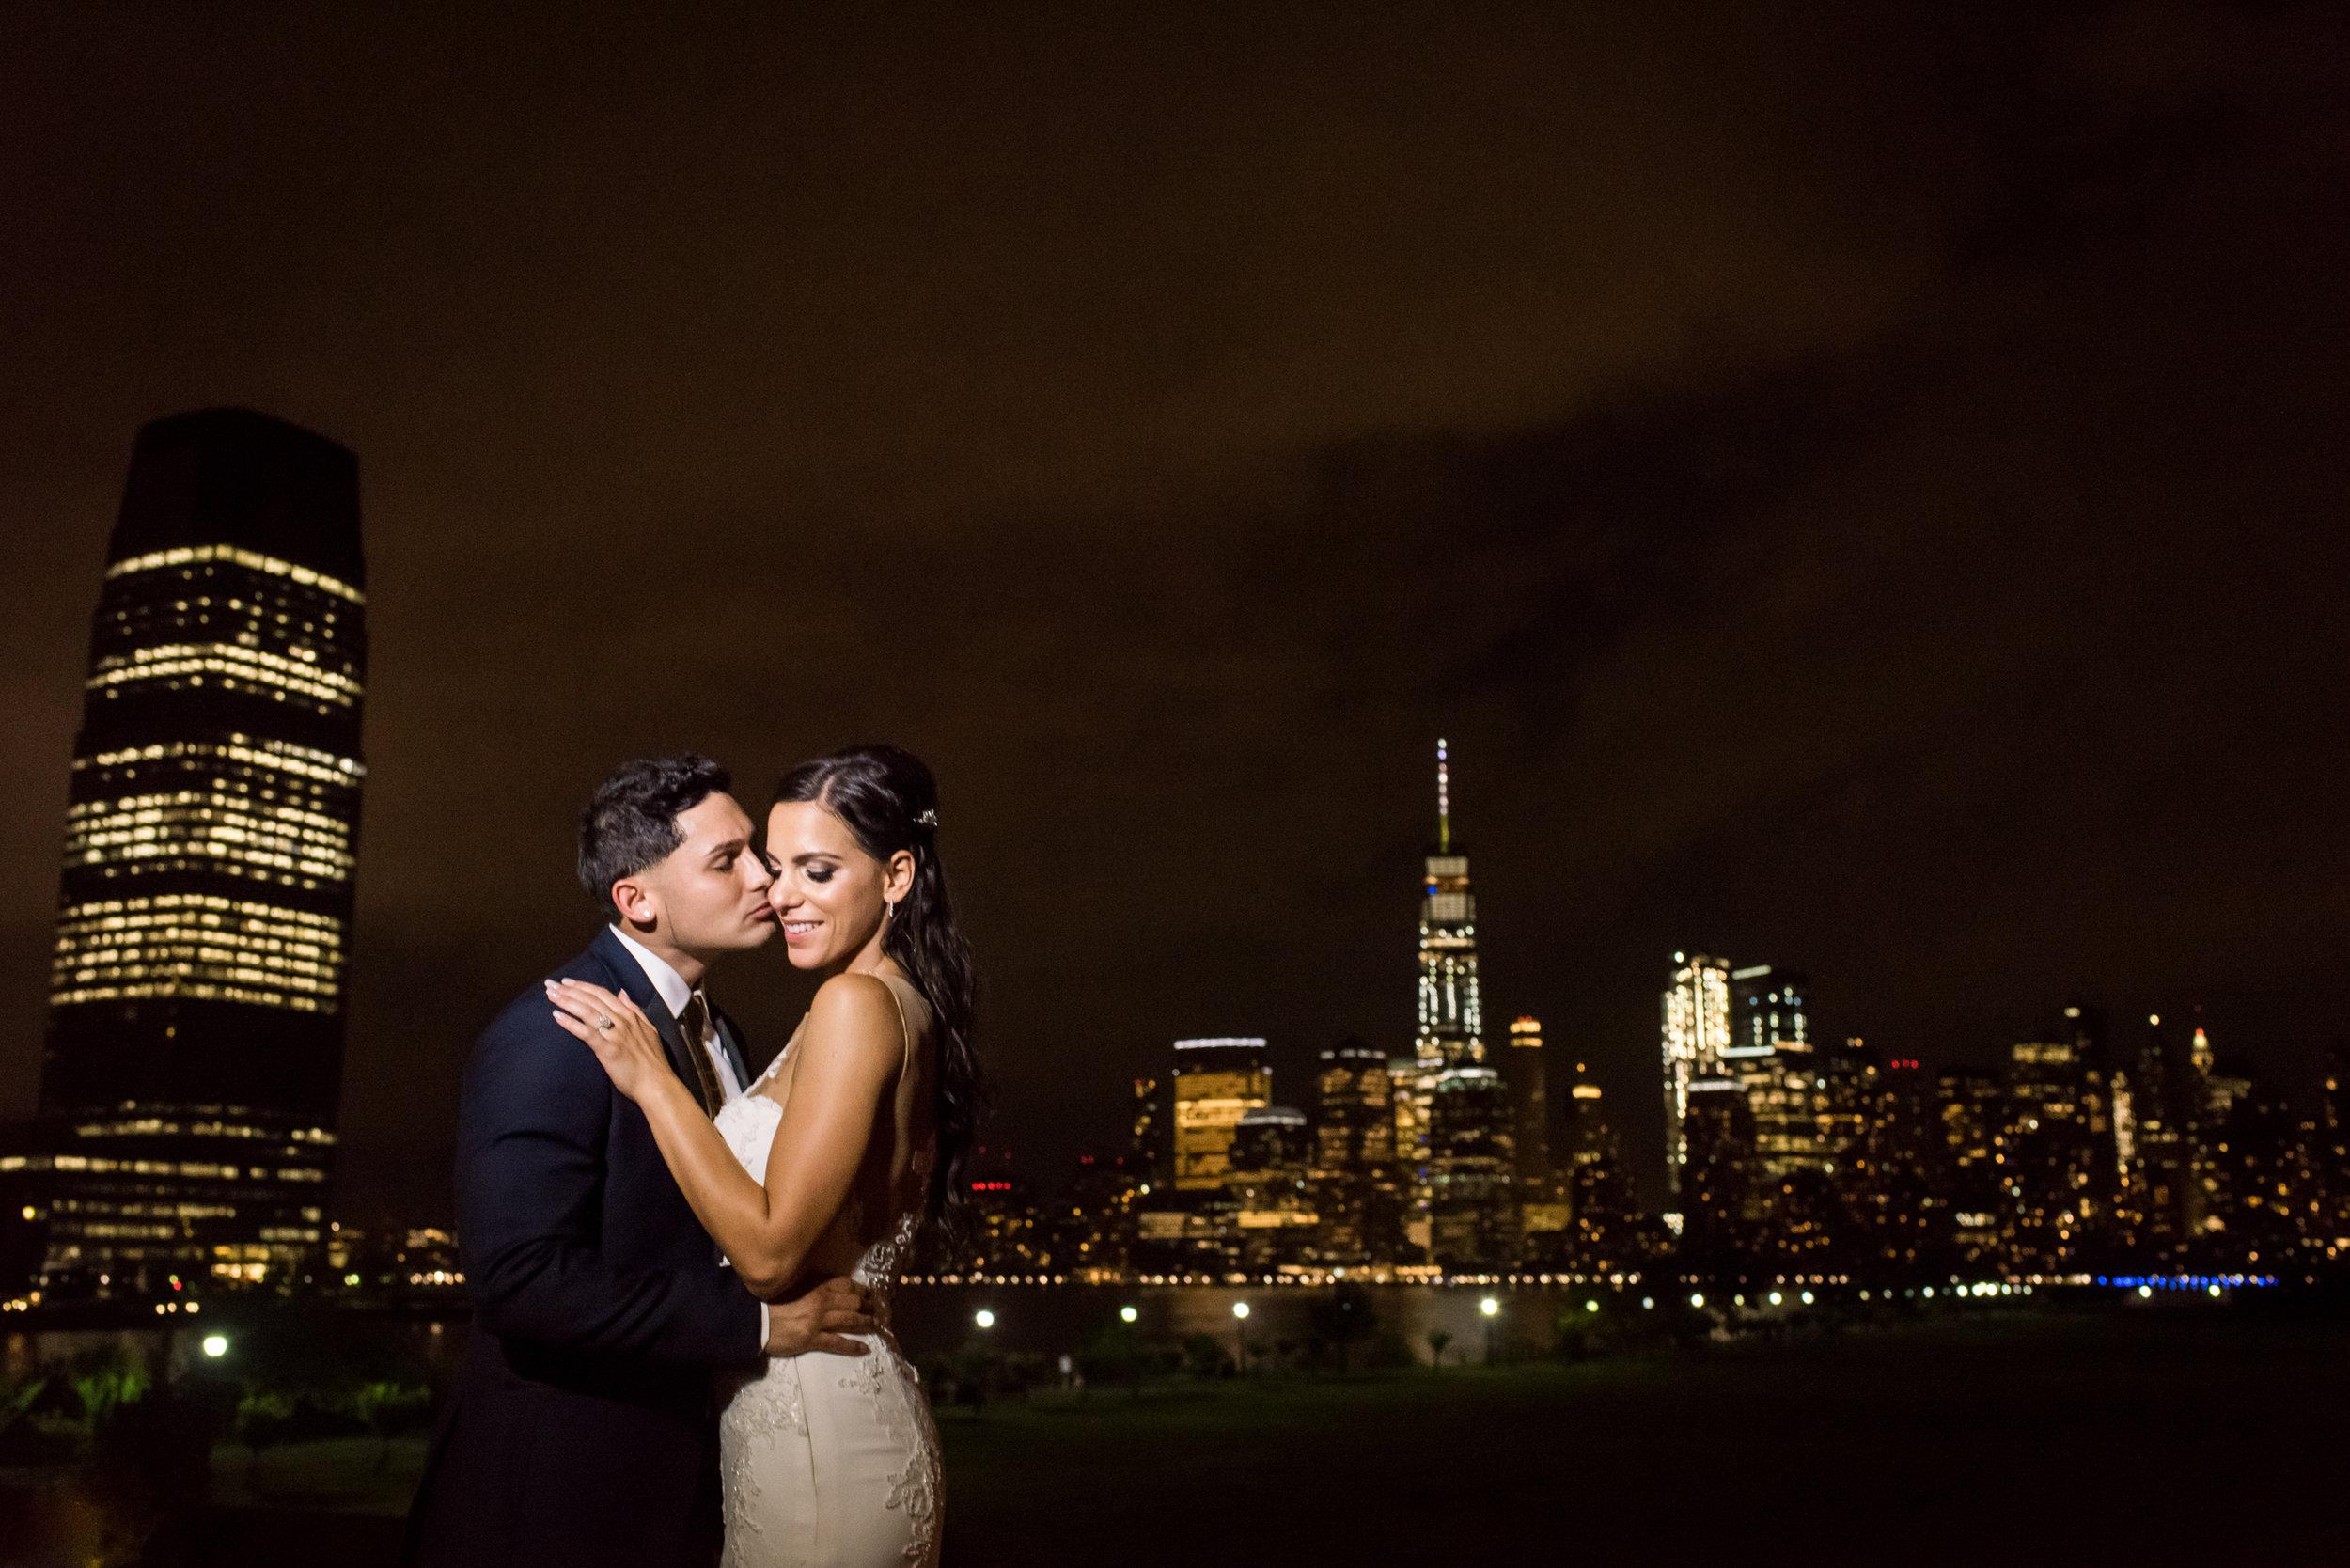 Stefy Hilmer Photography-bride and groom Manhattan skyline night portrait.jpg